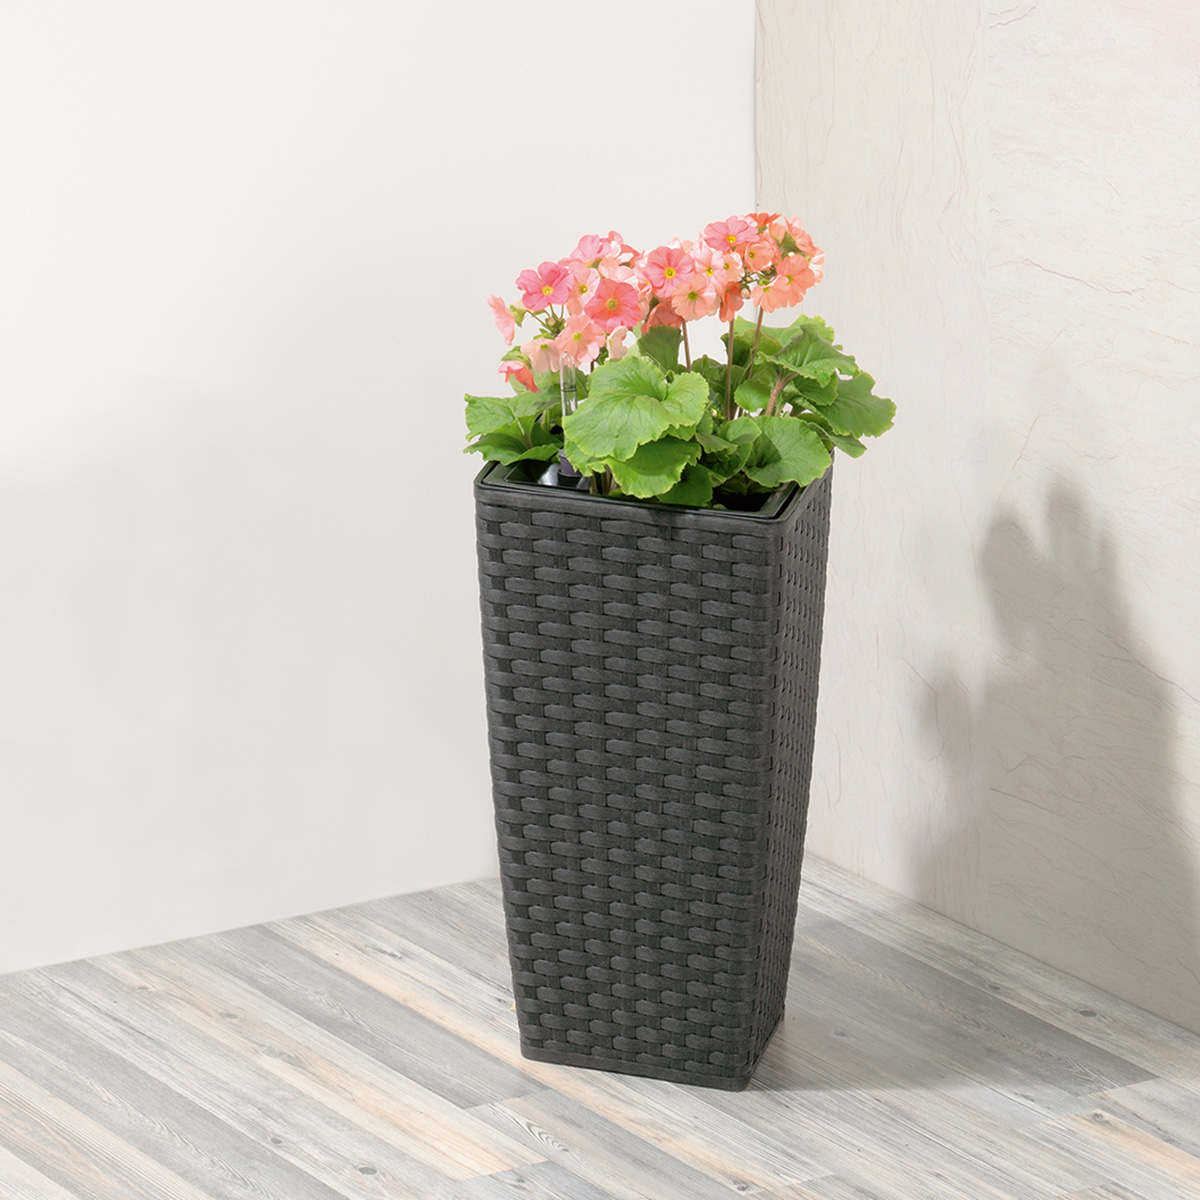 pflanzgefäß polyrattan mit bewässerungssystem, 26,5 x 26,5 x 50 cm